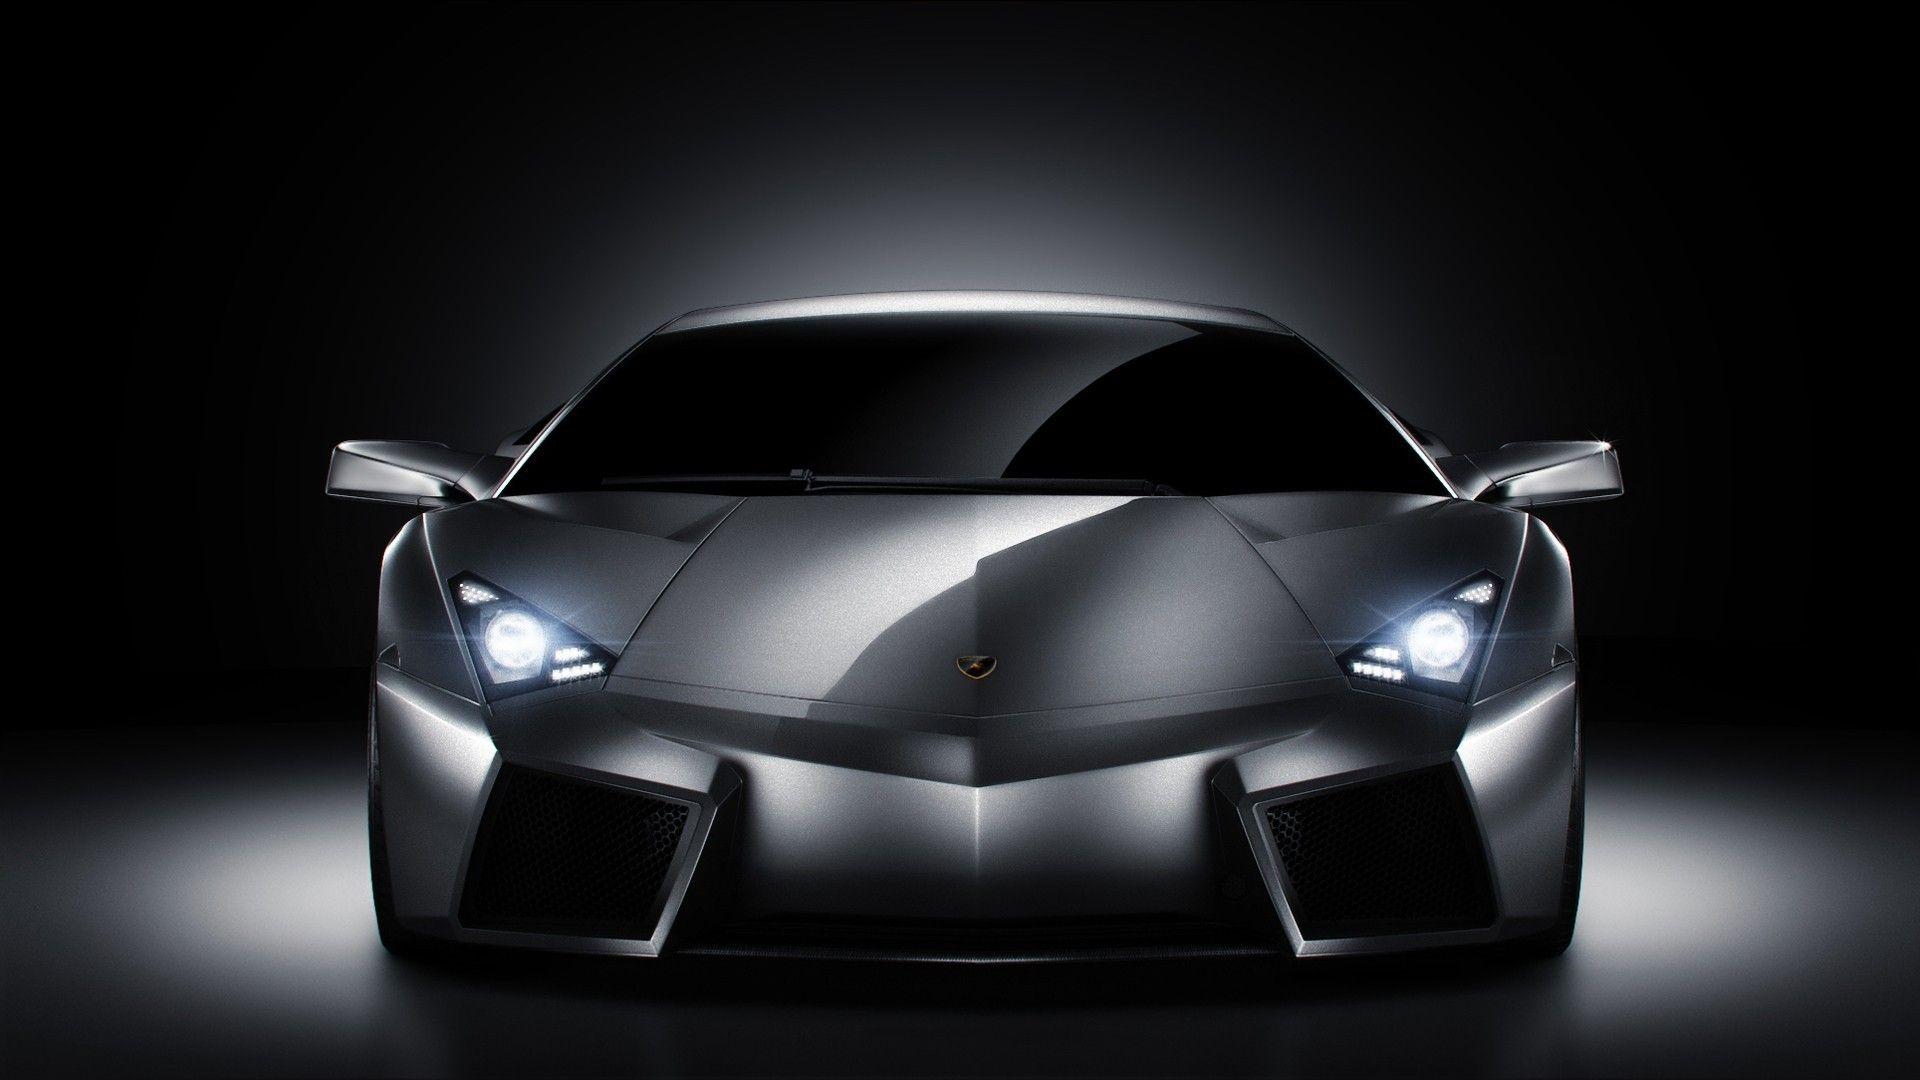 lamborghini egoista wallpaper 1080p. lamborghini reventon car hd desktop wallpaper cars no egoista 1080p